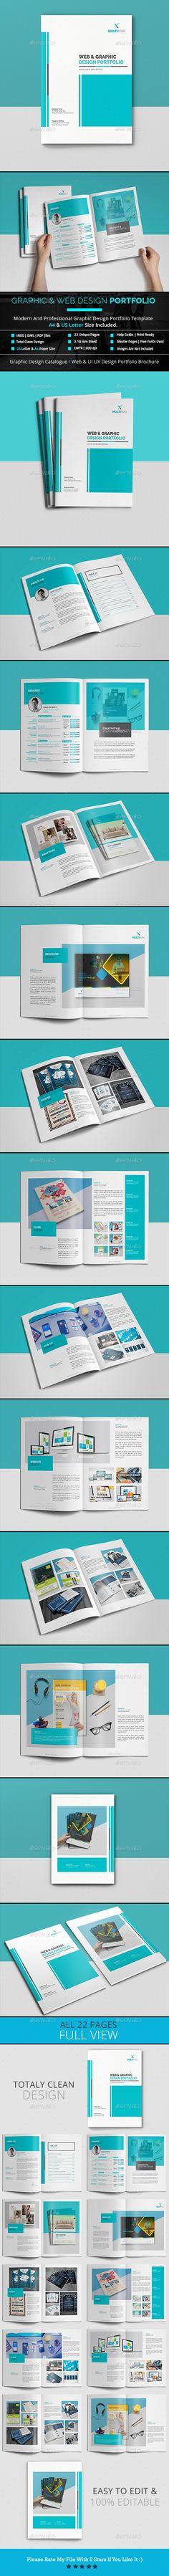 Graphic & Web Design Portfolio Template InDesign INDD - A4 & US Letter Size - 22 Unique Pages